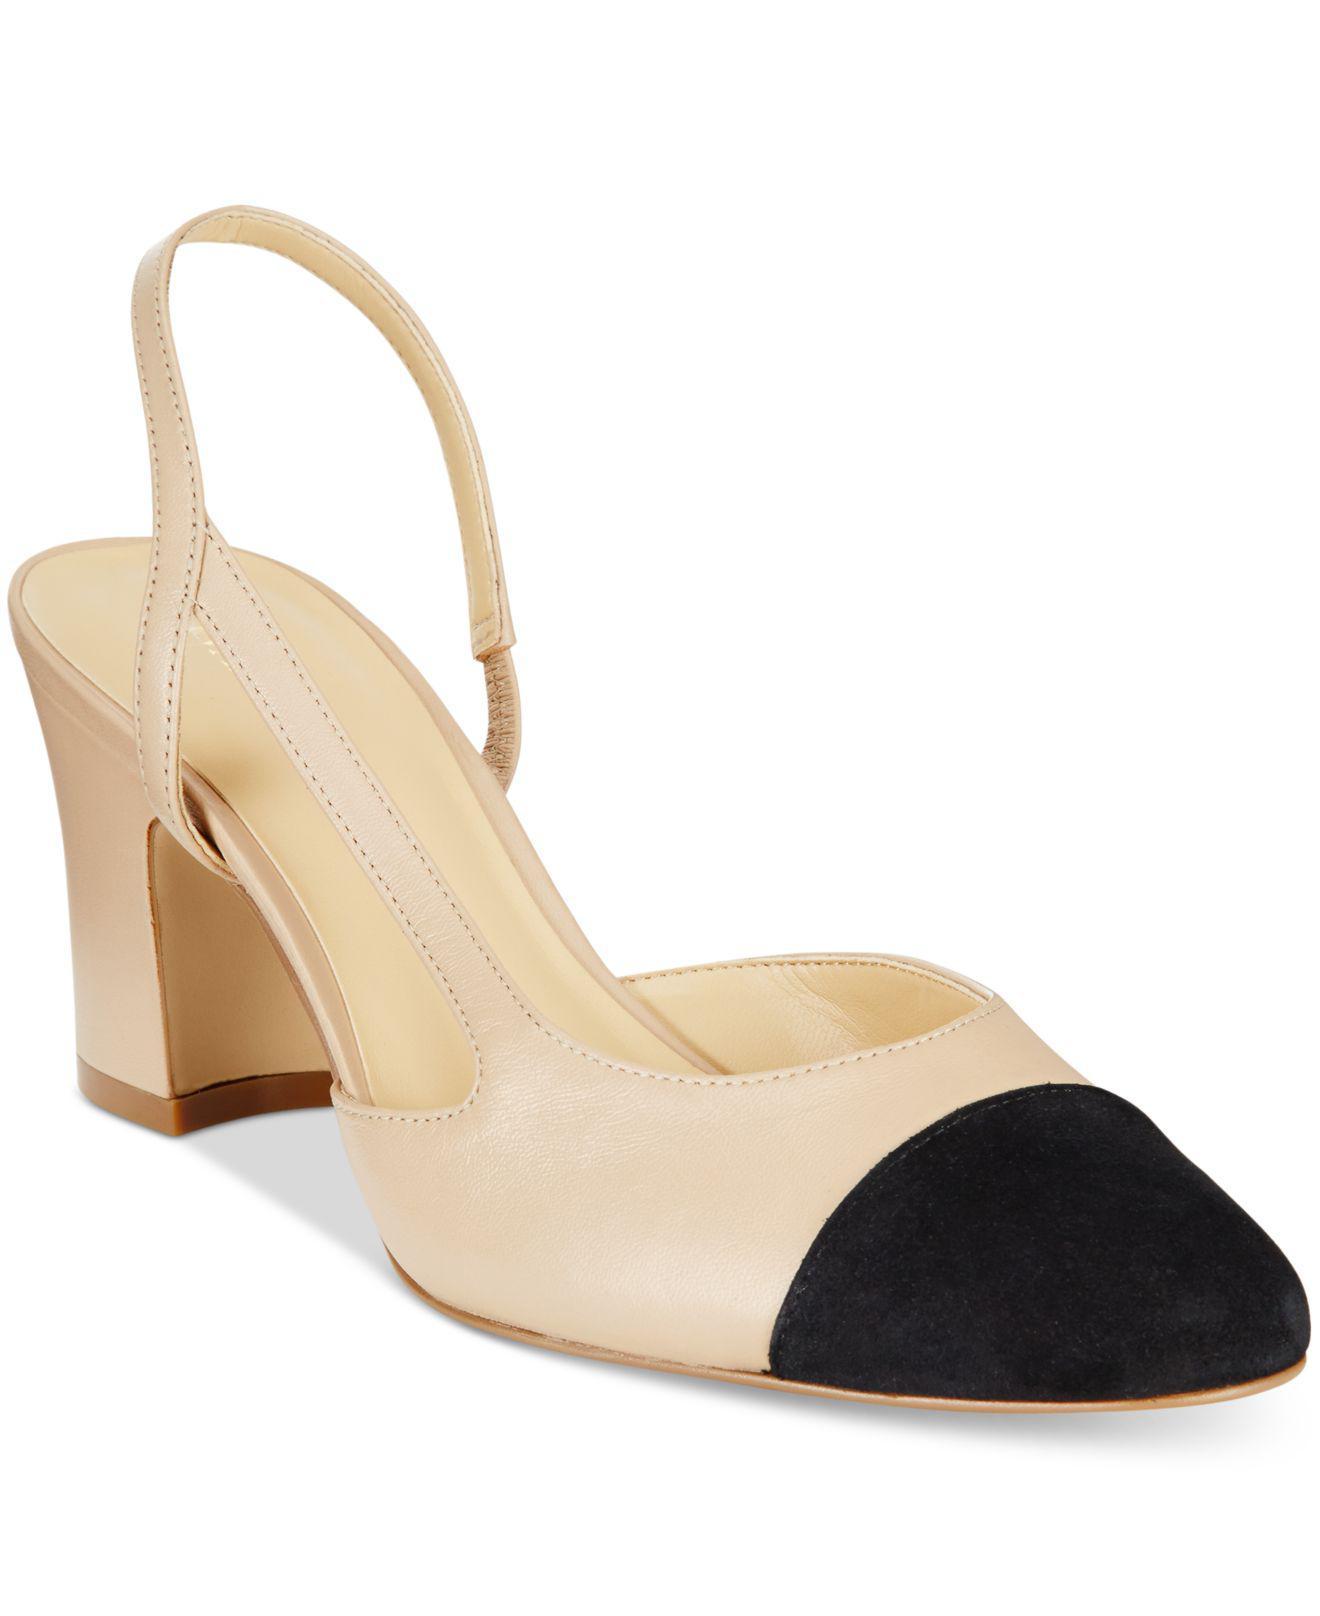 Ivanka Trump. Women's Natural Liah Slingback Block-heel Pumps